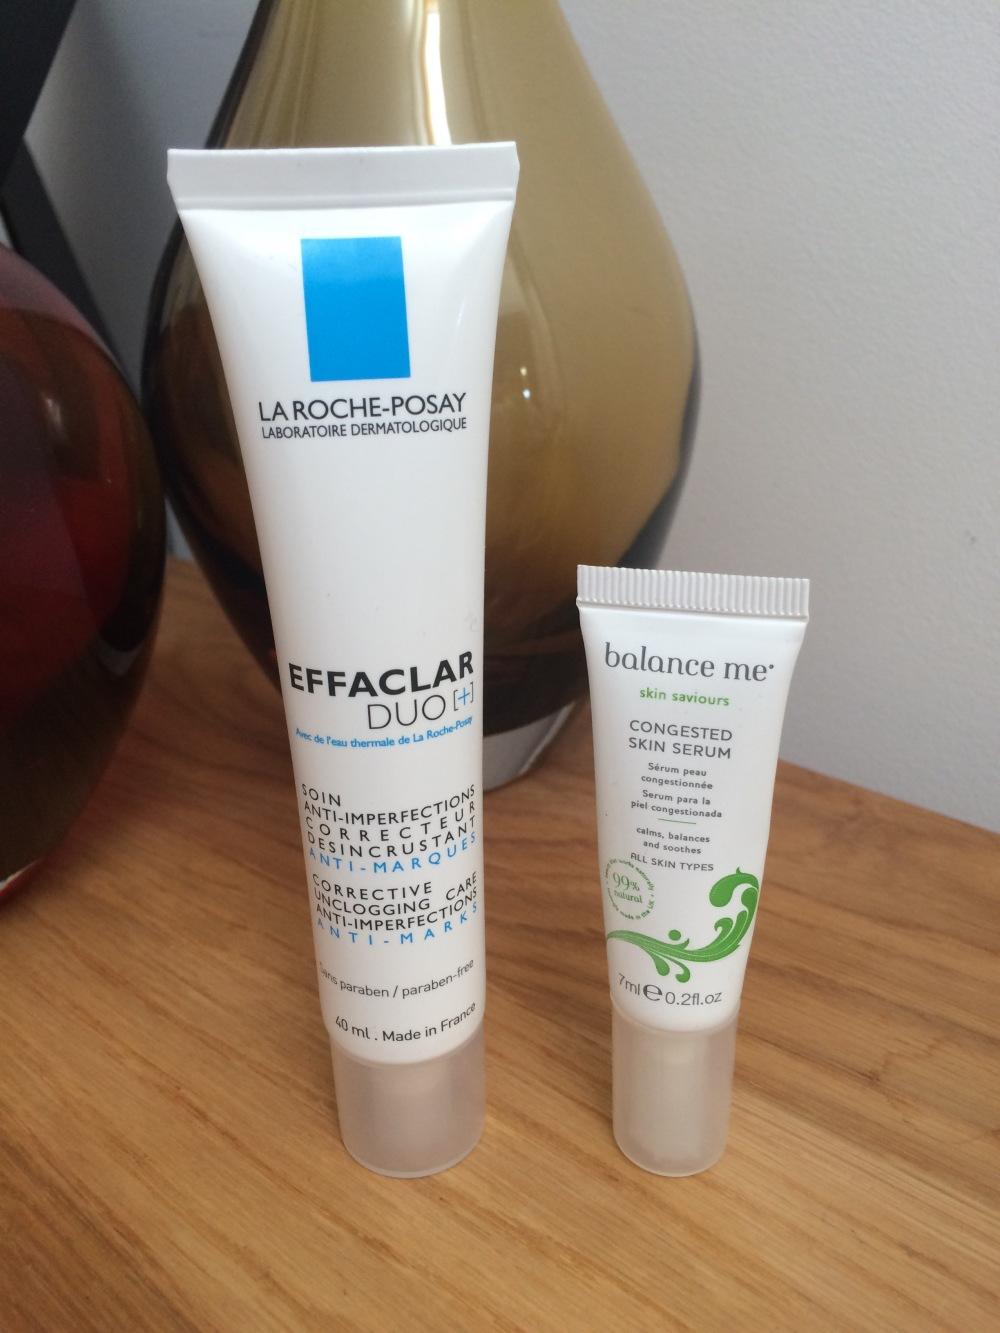 look-fantastic-my-skin-solutions-healthy-skin-box-oily-blemish-prone-skin-effaclar-duo-balance-me-serum